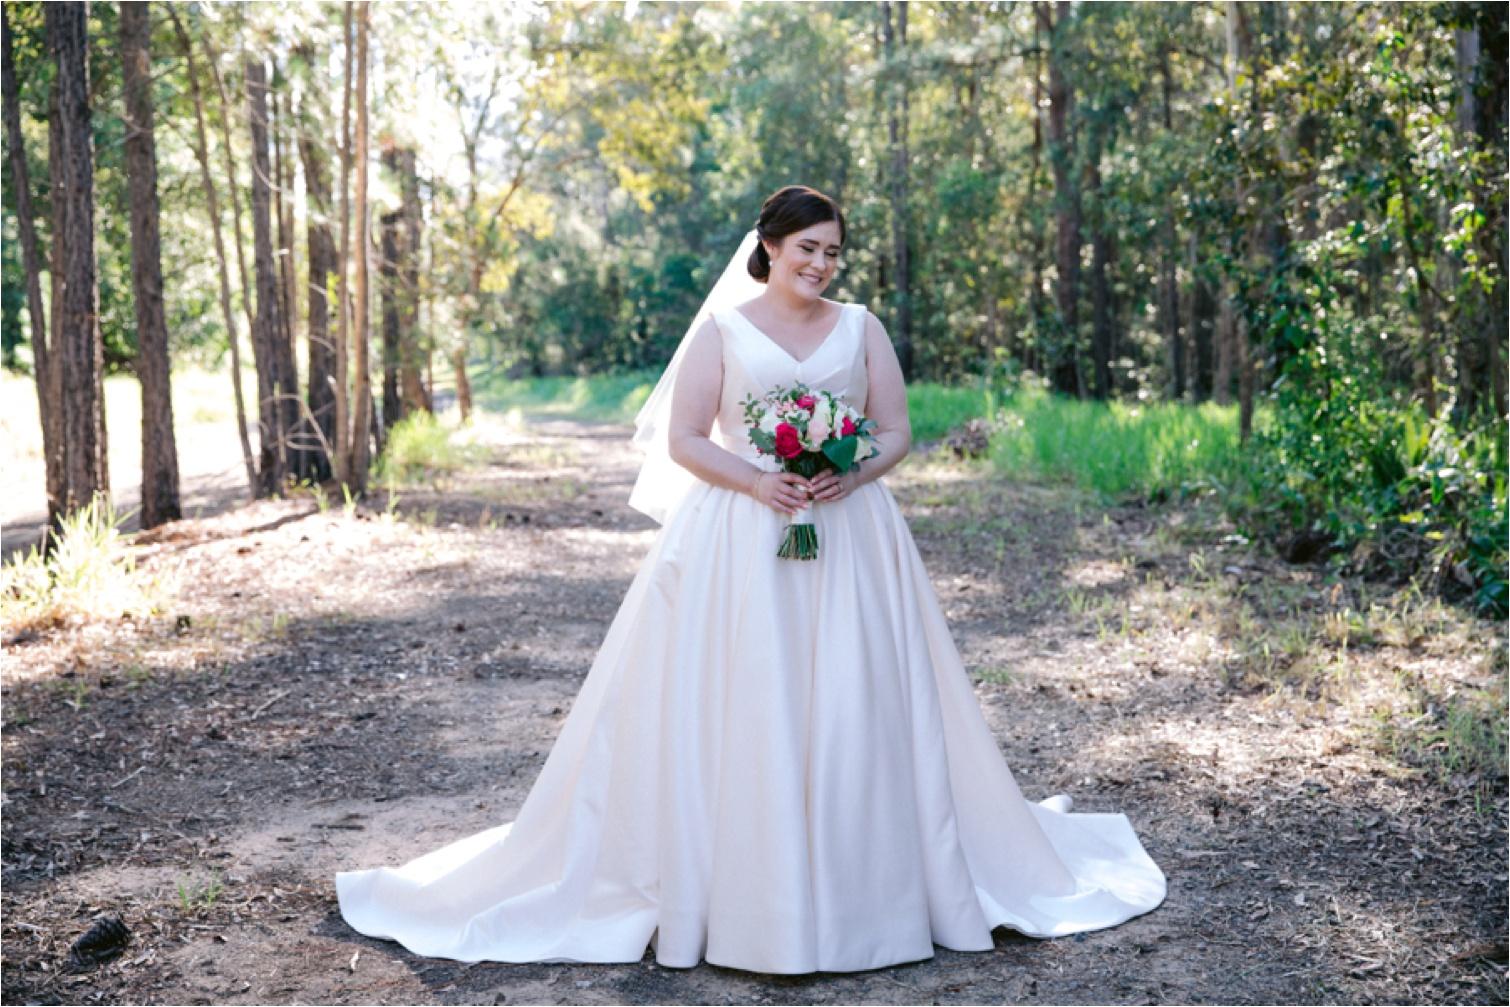 Bribie_Island_Wedding_Photography_0048.jpg